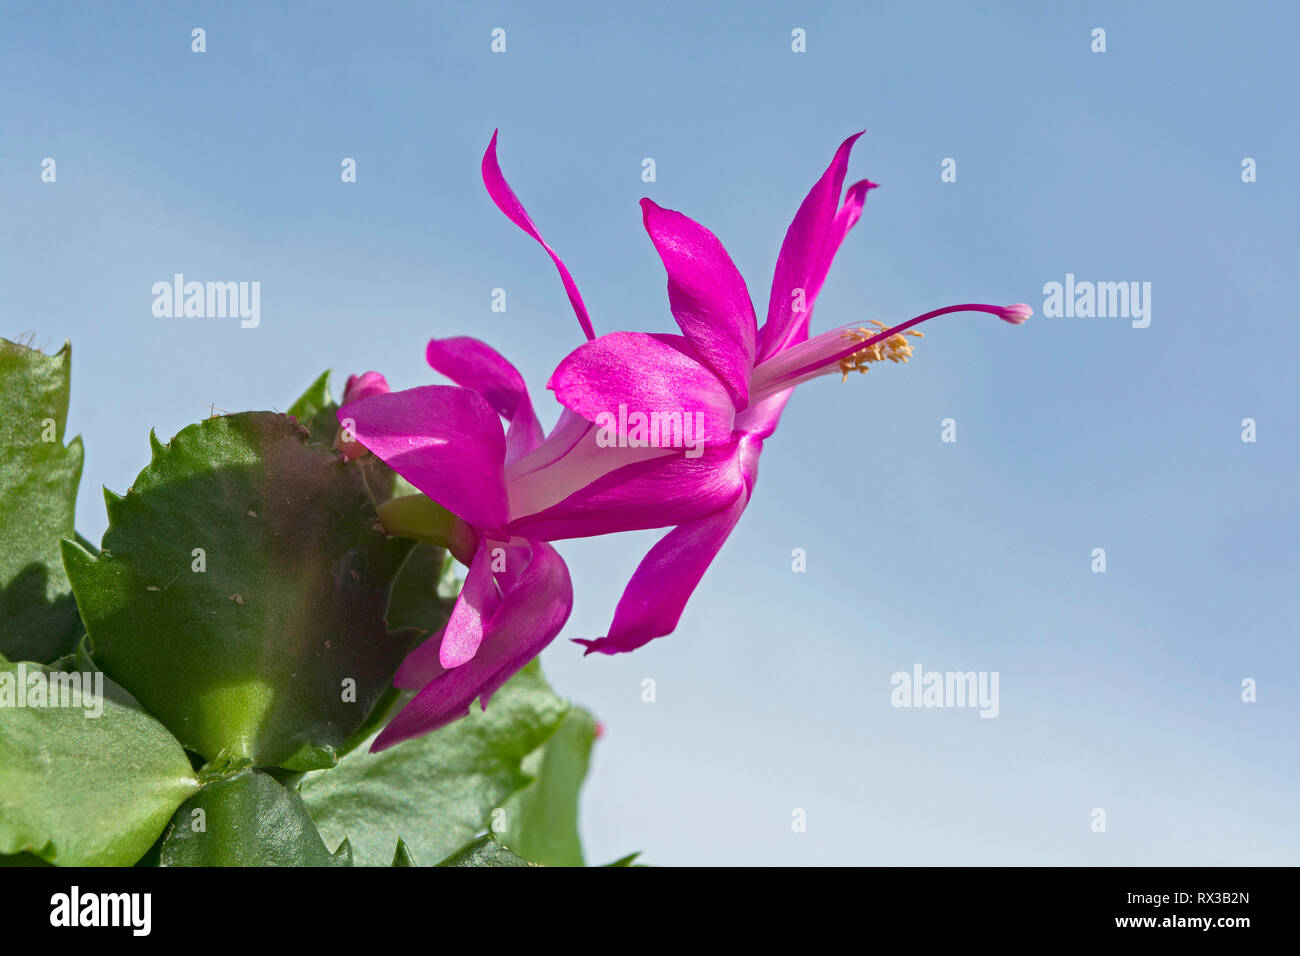 dark pink magenta christmas cactus flower and green stems against a hazy blue sky - Stock Image